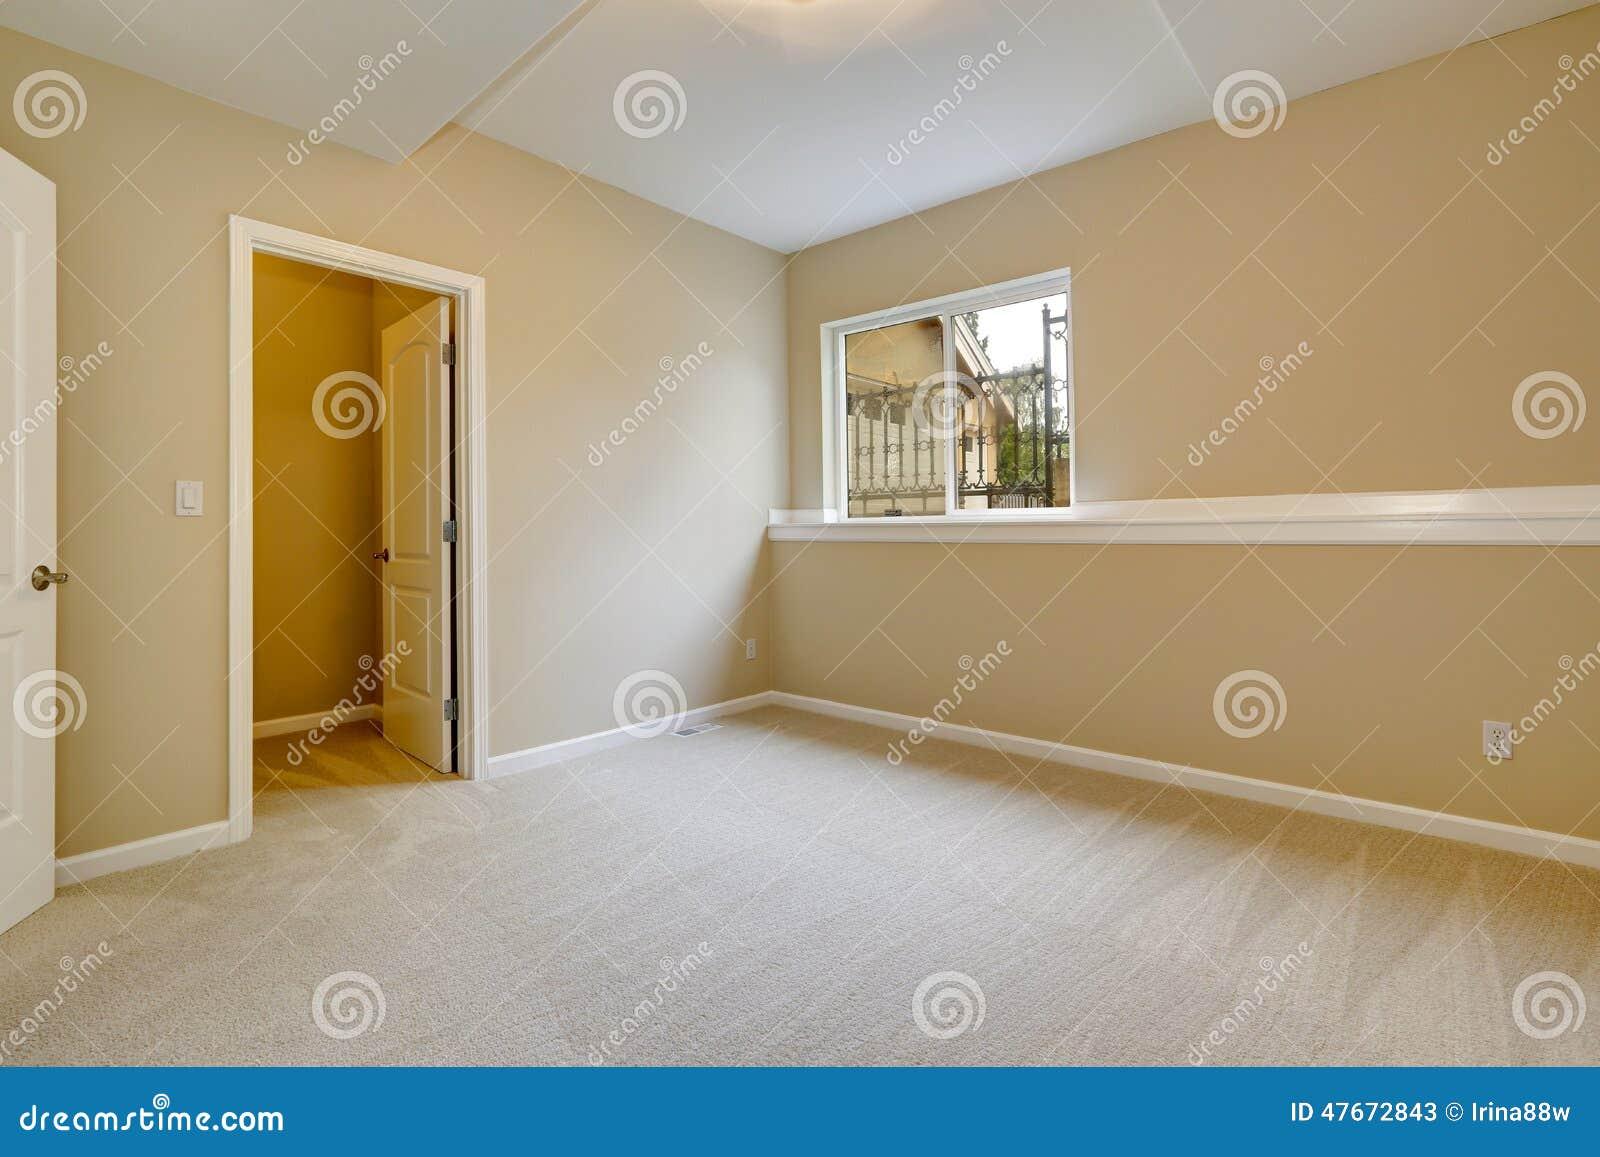 Bright Empty Bedroom In Light Ivory Tone Stock